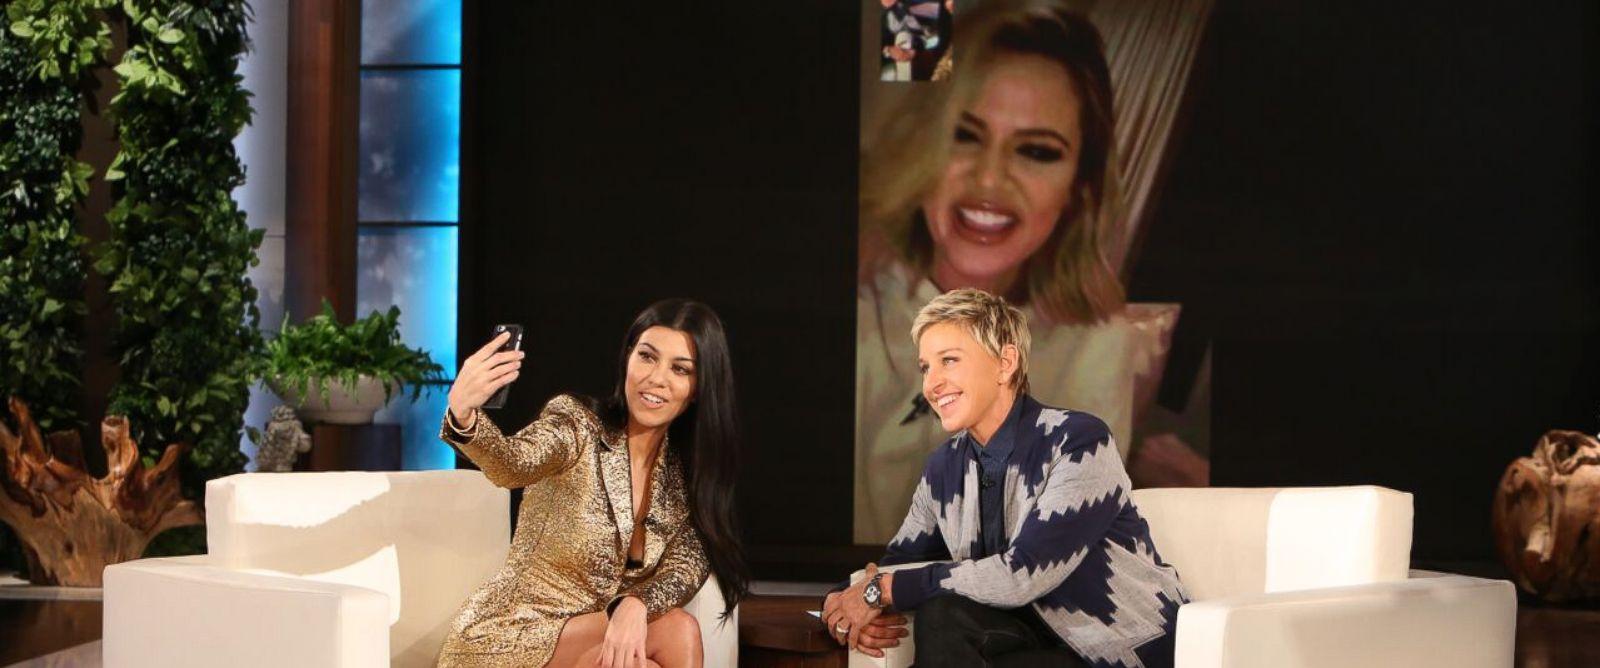 PHOTO: Kourtney Kardashian FaceTimed Khloe Kardashian on the Ellen DeGeneres Show, Jan.25, 2016.